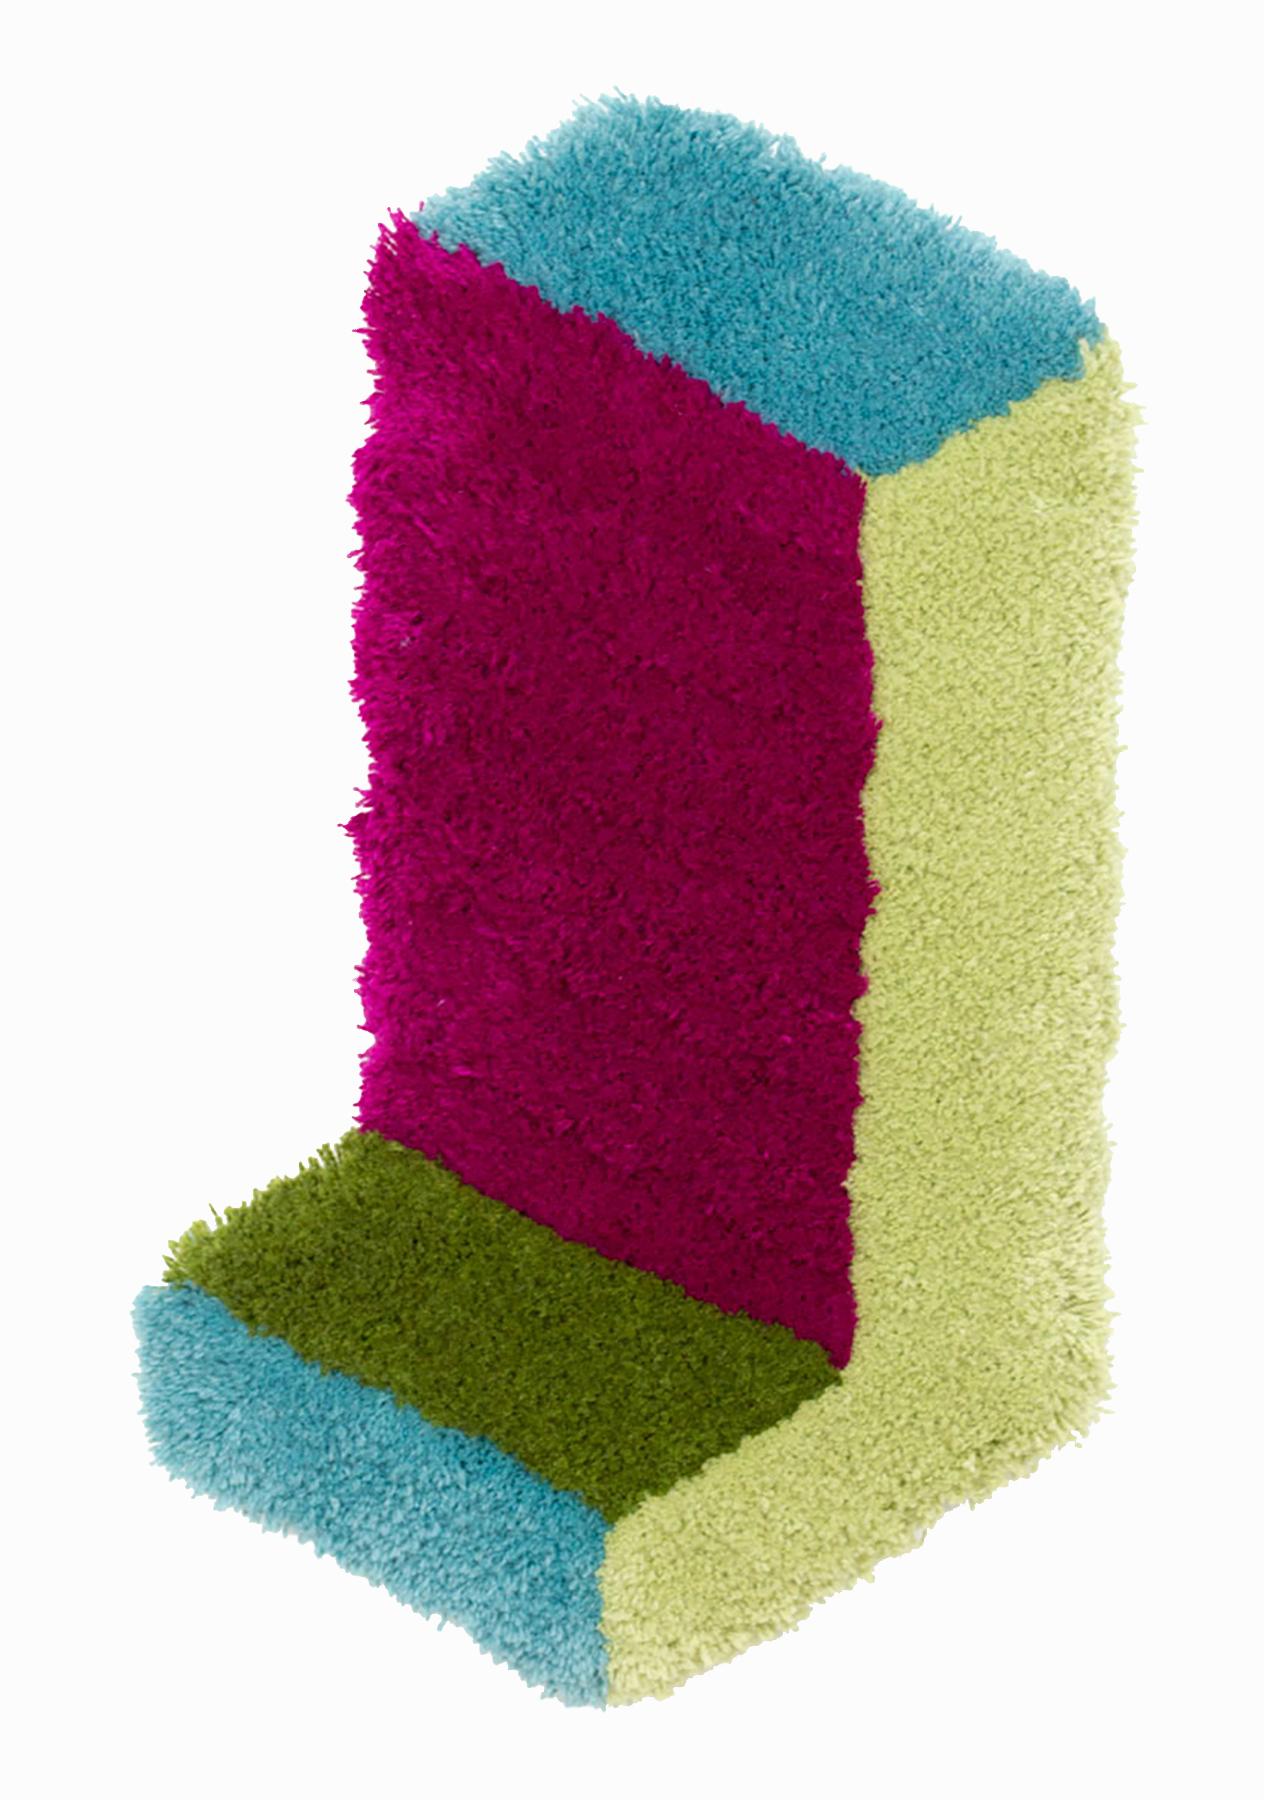 Corner Leg, 26 x 14.5 inches / 66 x 36.8 cm, wool yarn on wood panel, 2019